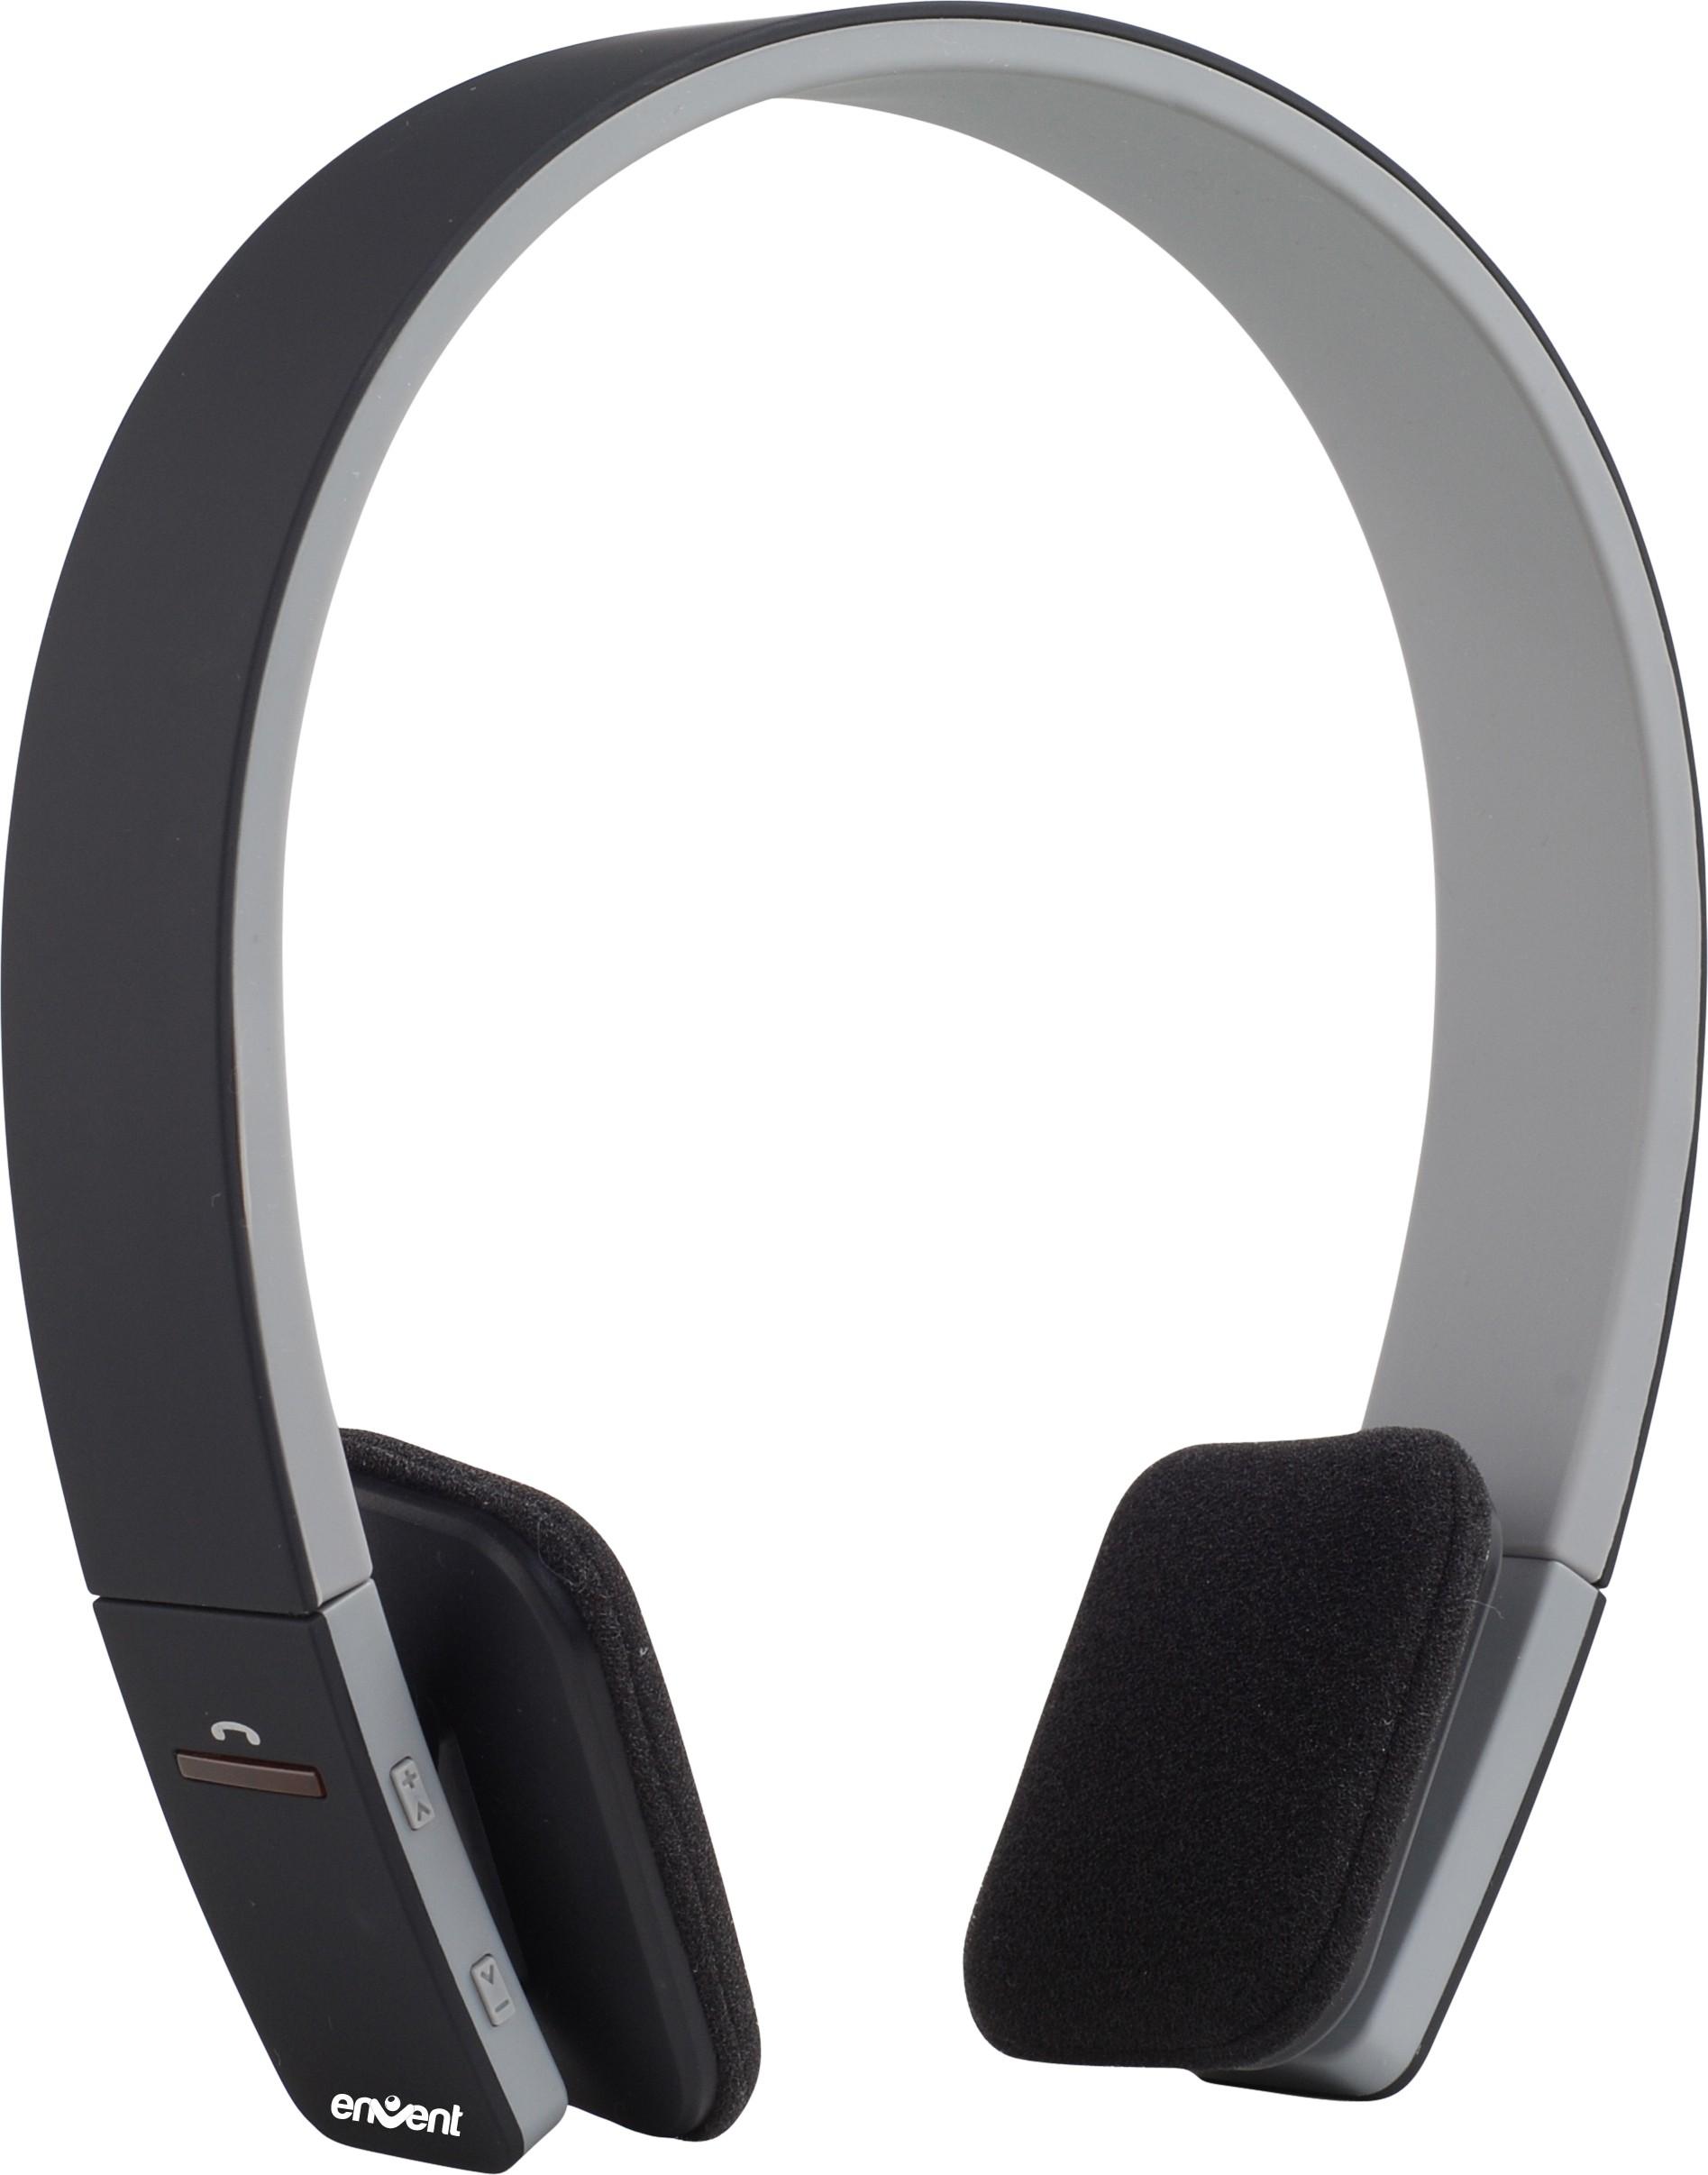 Flipkart - Premium Rage of Headphones Starting at ₹1,299